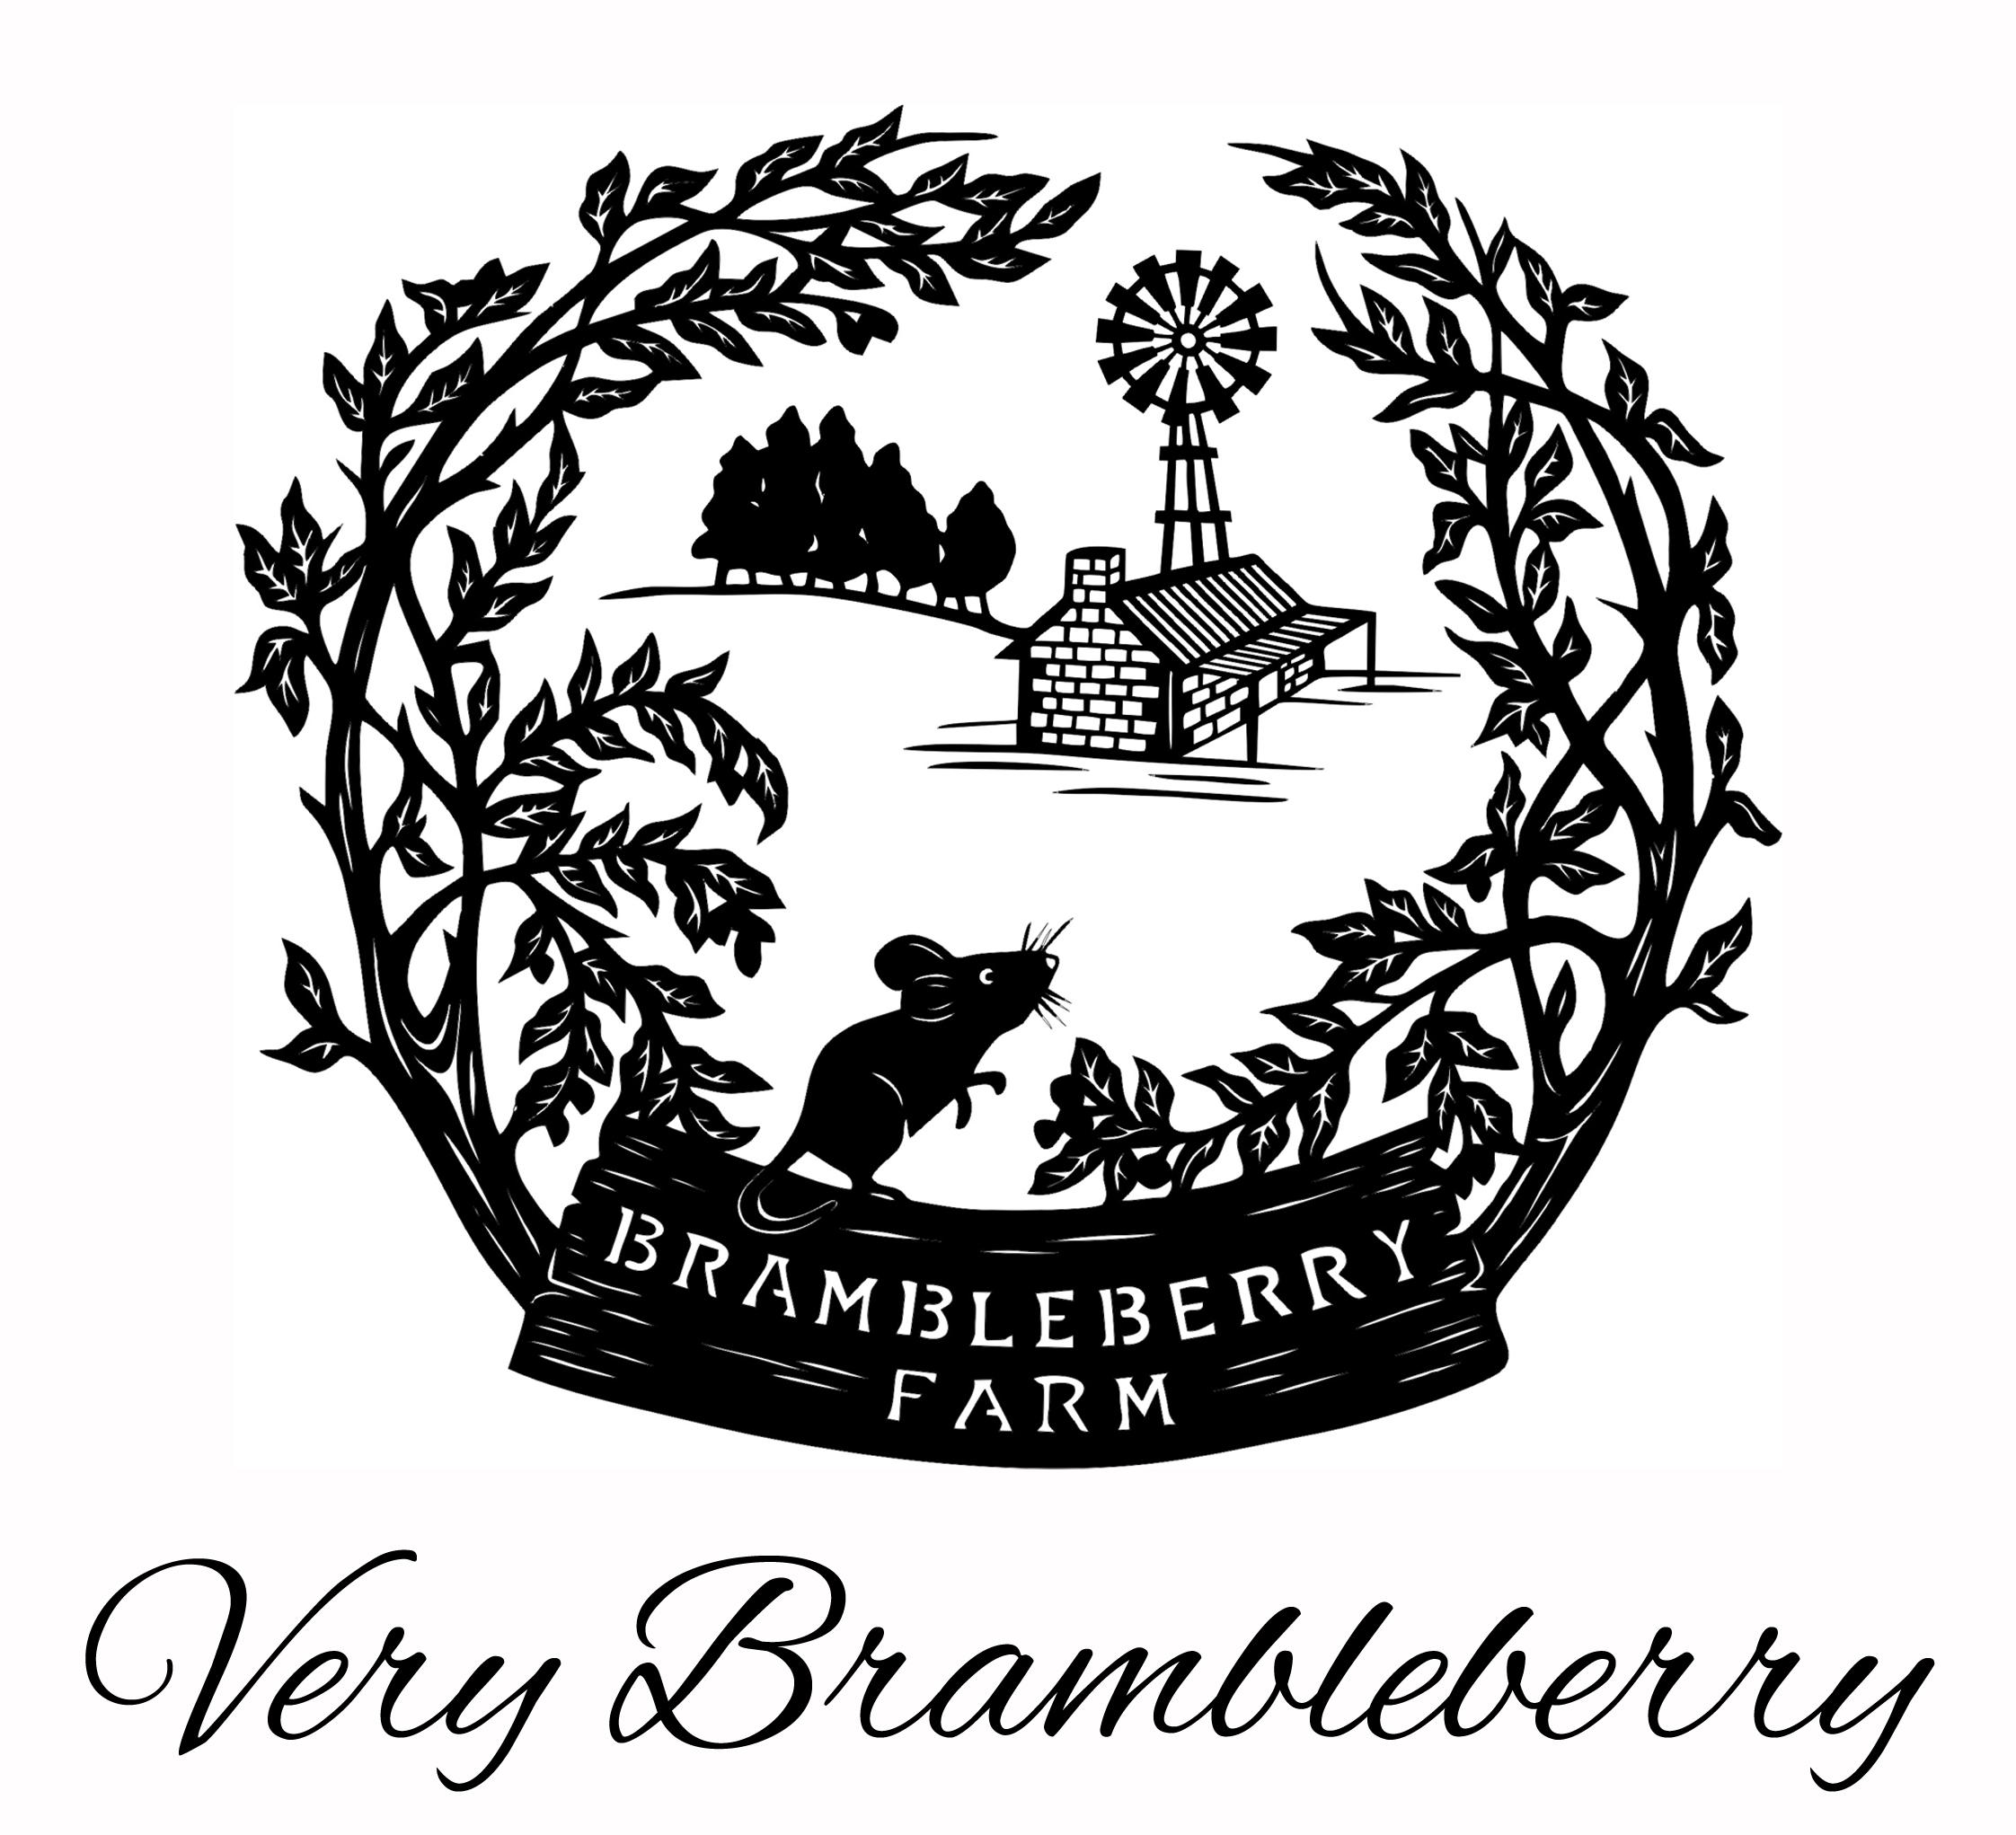 Very Brambleberry.